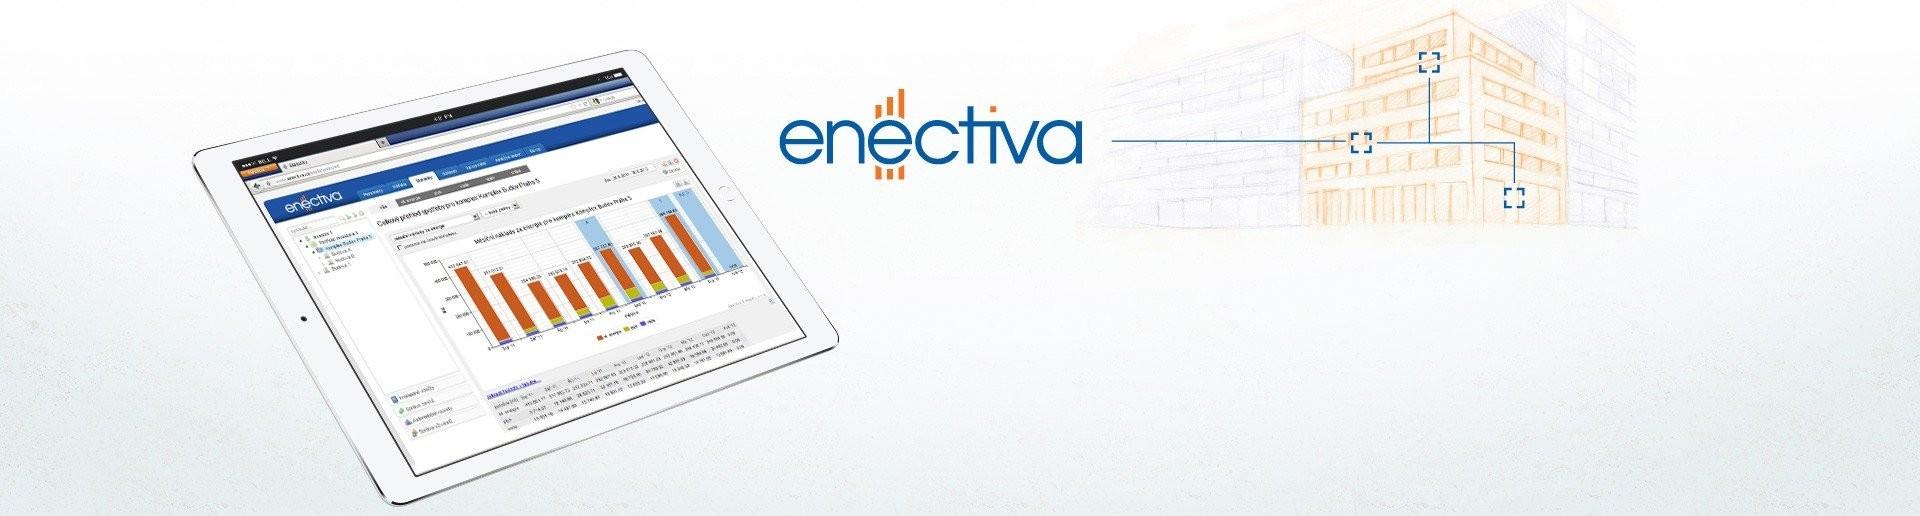 Monitorización Energética On-line